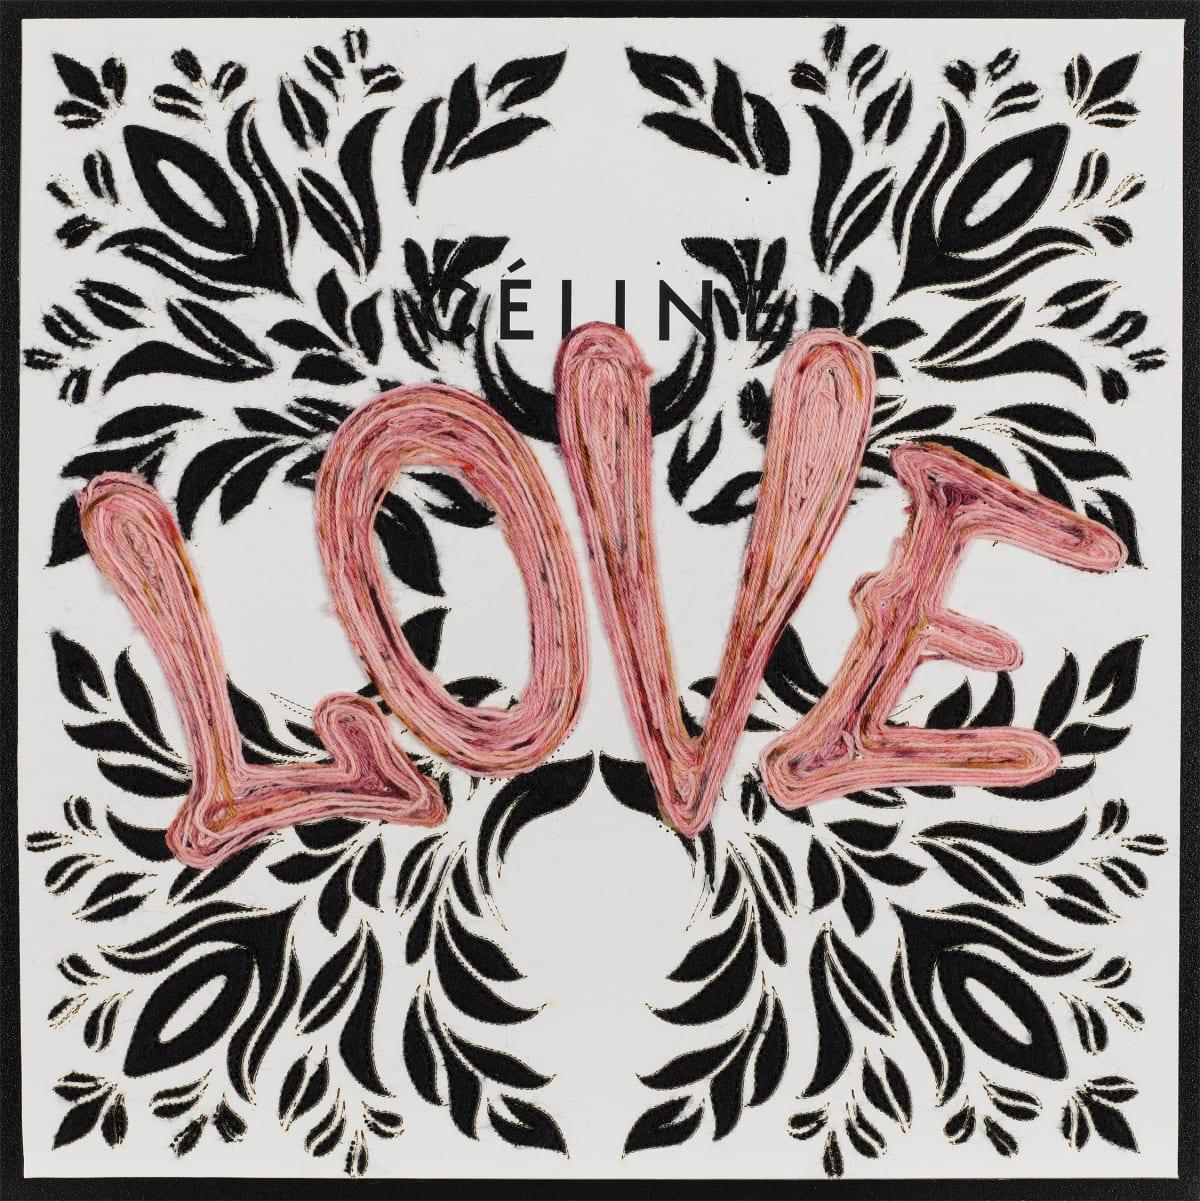 Stephen Wilson, Celine Love , 2019